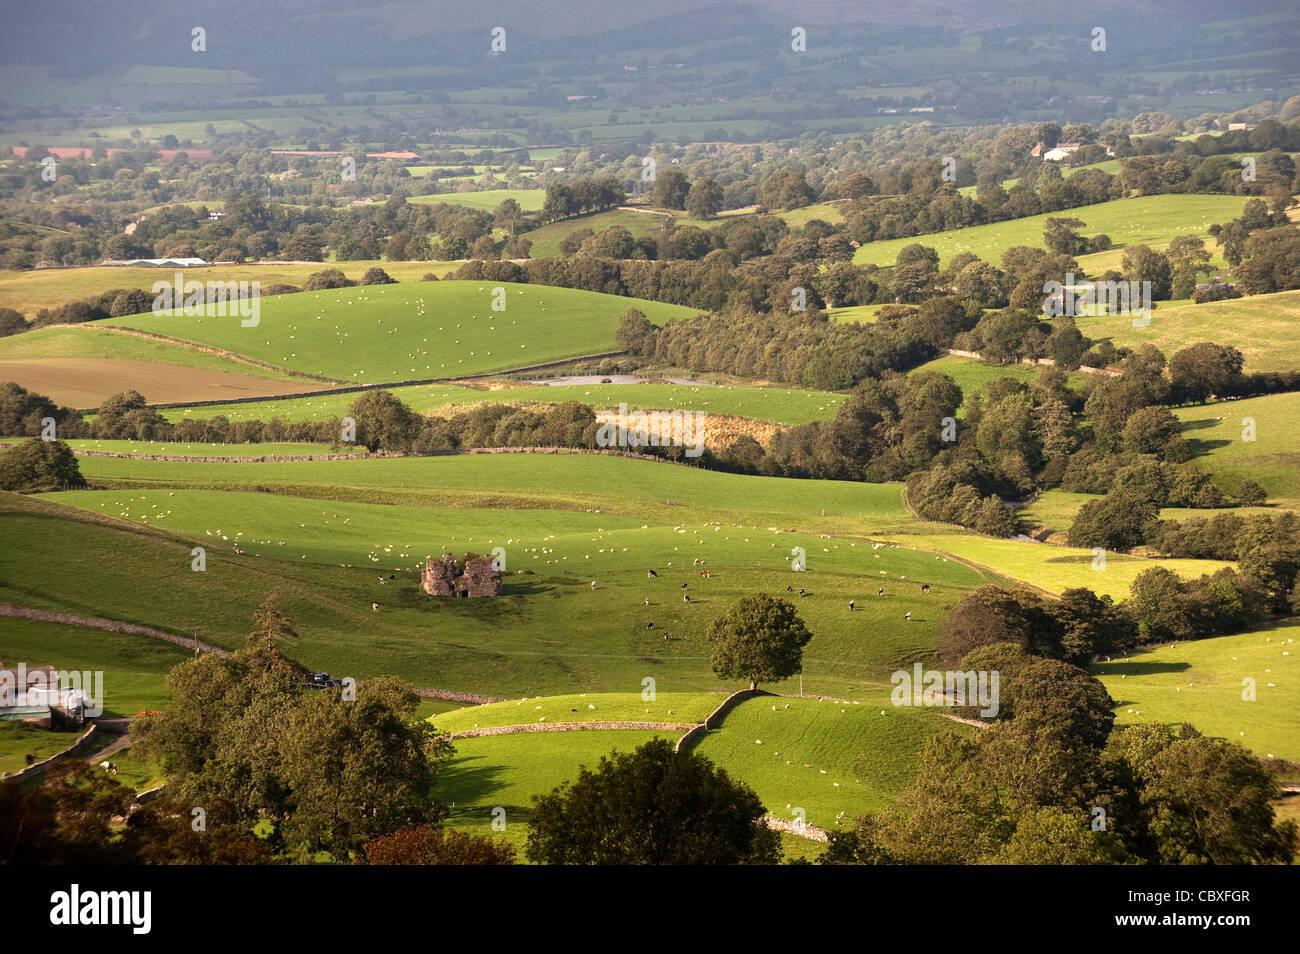 View from Wharton Fell overlooking Lammerside Castle in the upper Eden Valley near Kirkby Stephen. - Stock Image